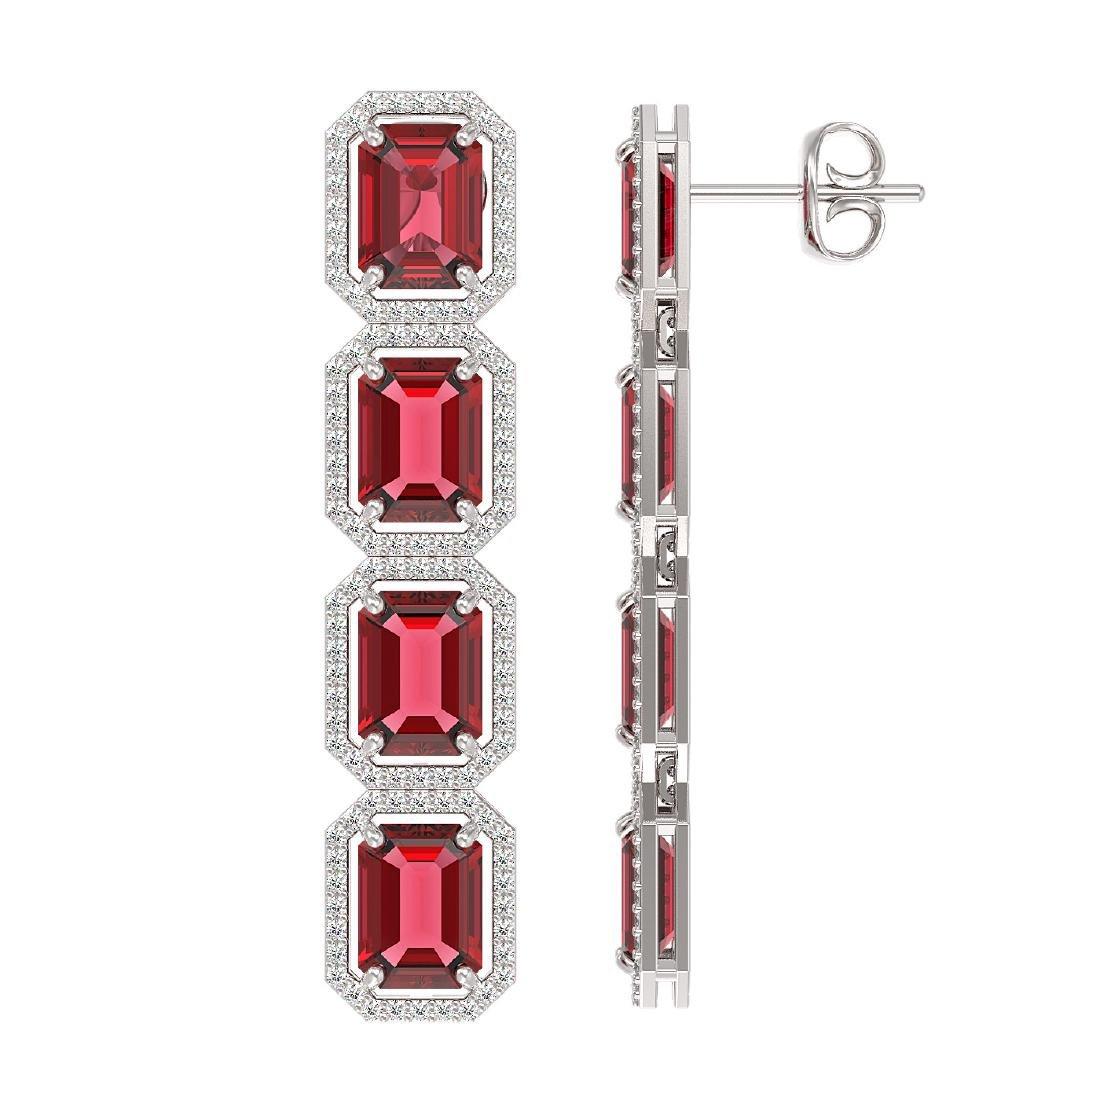 19.44 CTW Tourmaline & Diamond Halo Earrings 10K White - 2